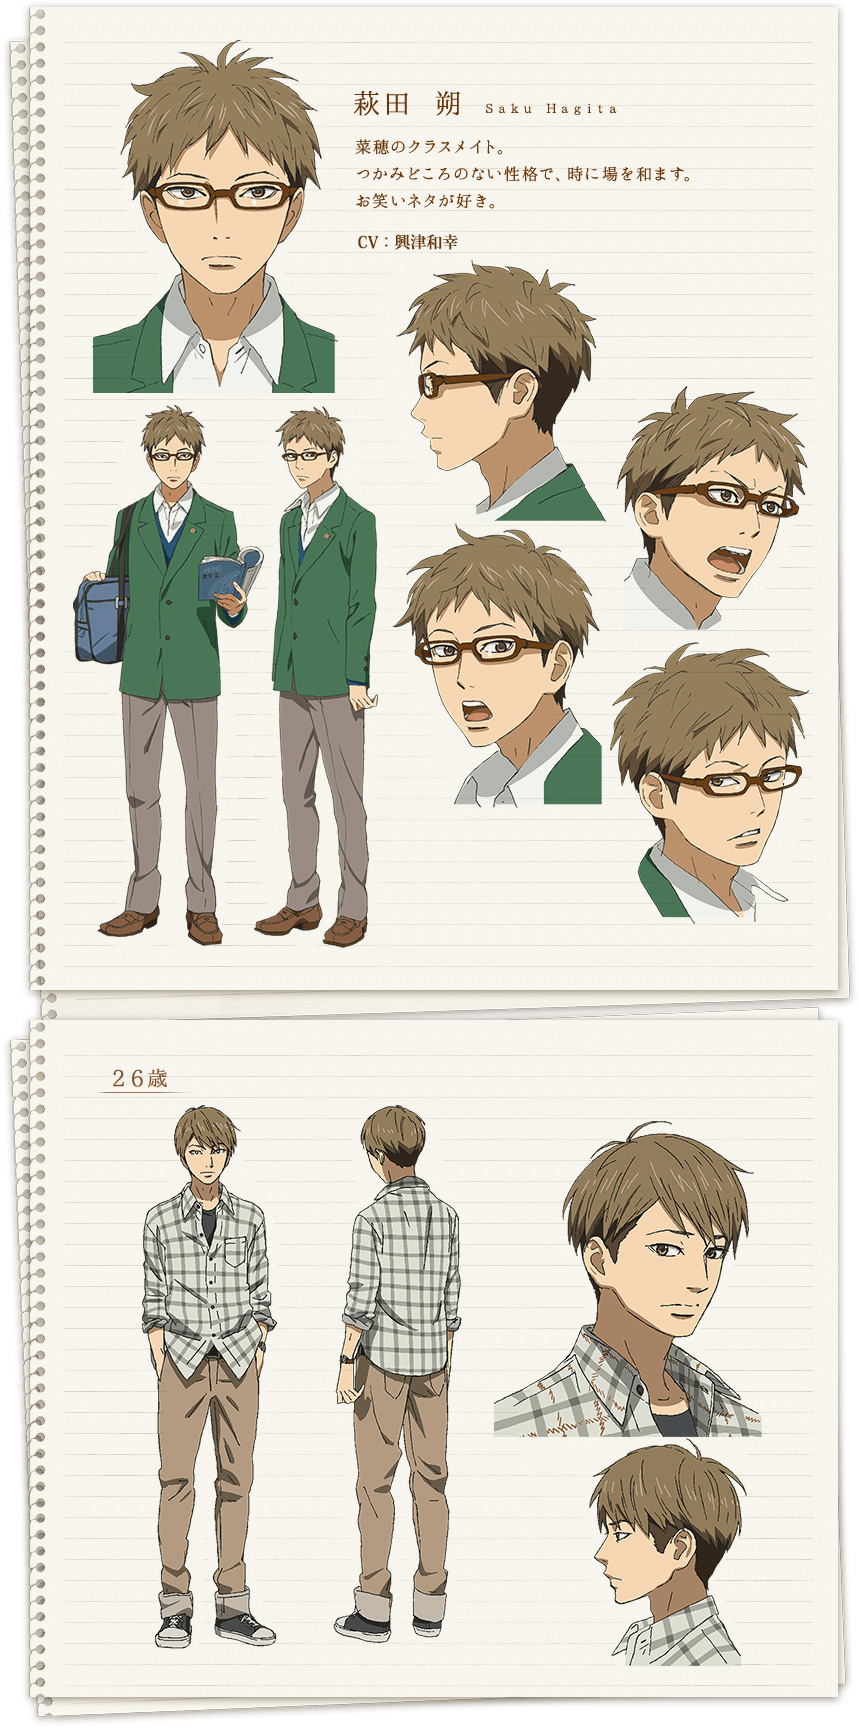 Orange-Anime-Character-Designs-Saku-Hagita